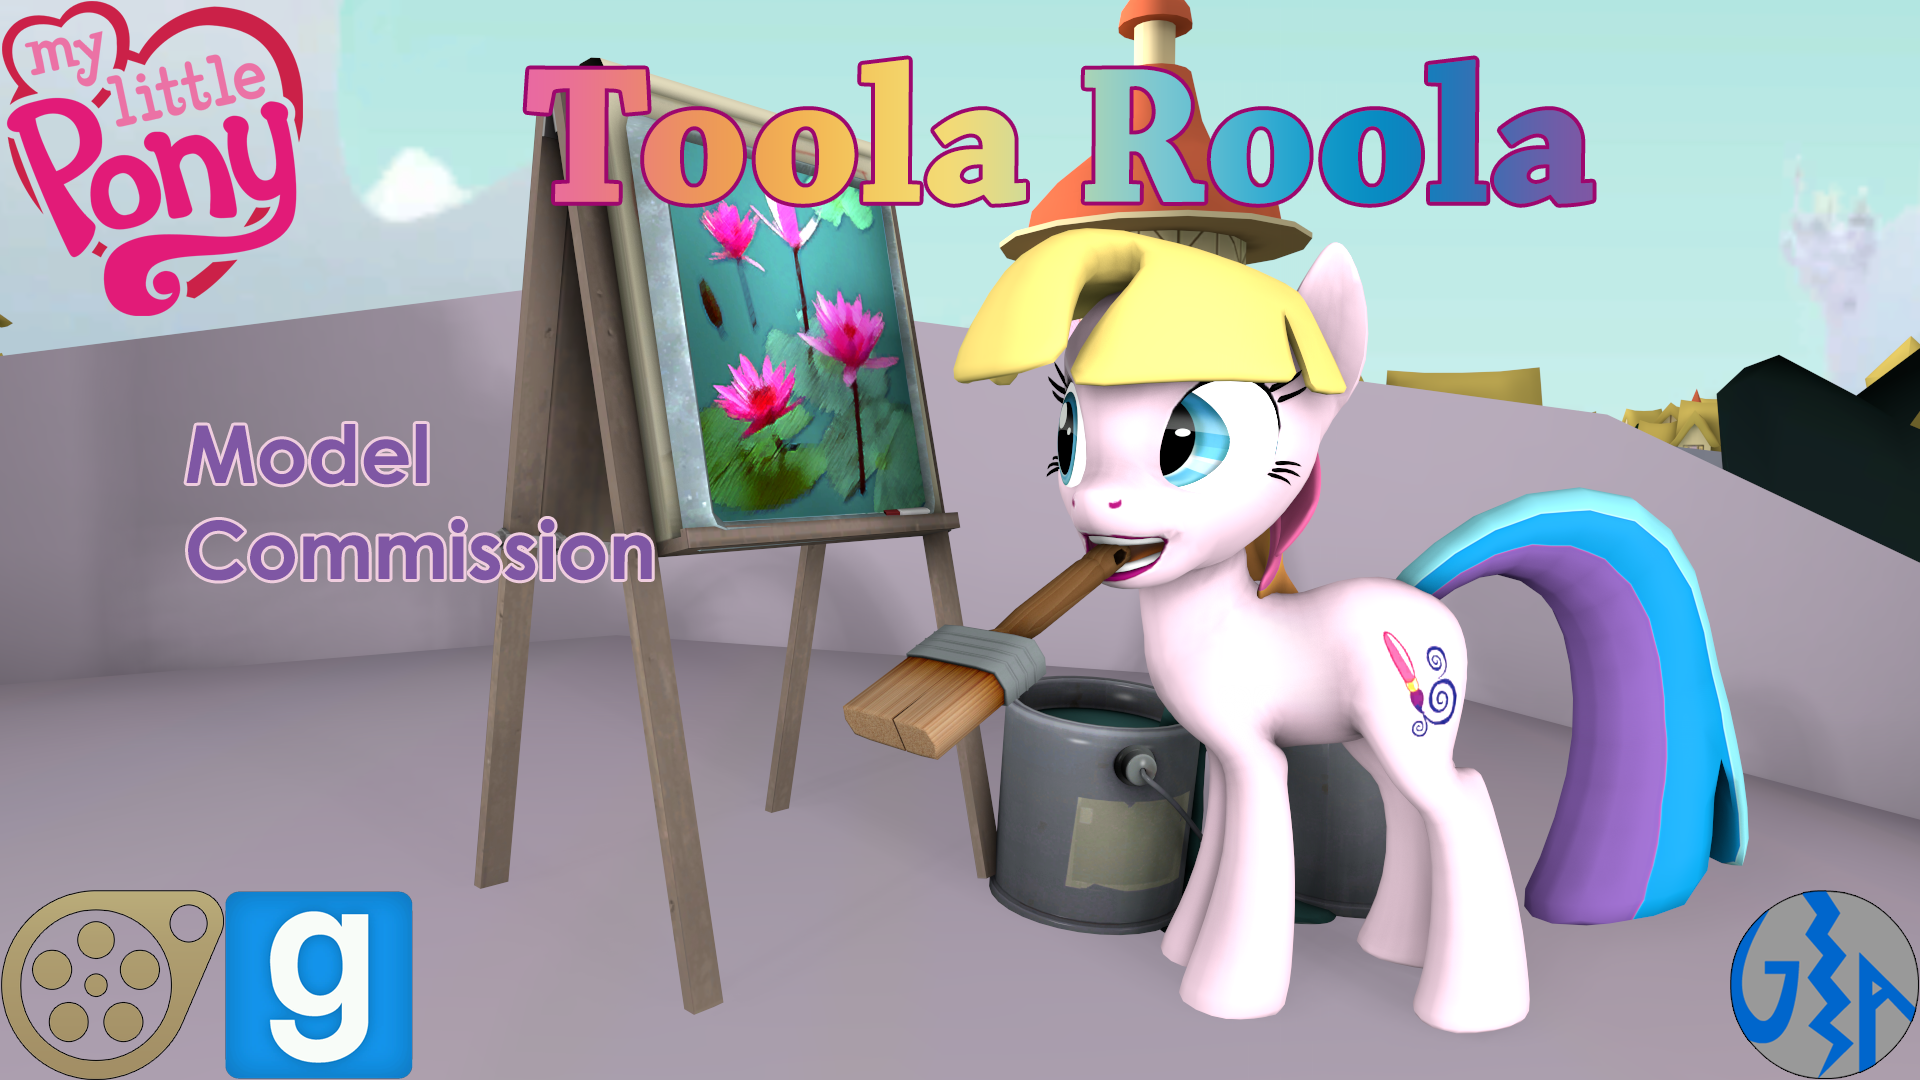 Mlp Stuff Gmod Sfm 3d Art Compilation: Toola Roola (MLP G3, SFM/GMod DL) Commission By GameAct3